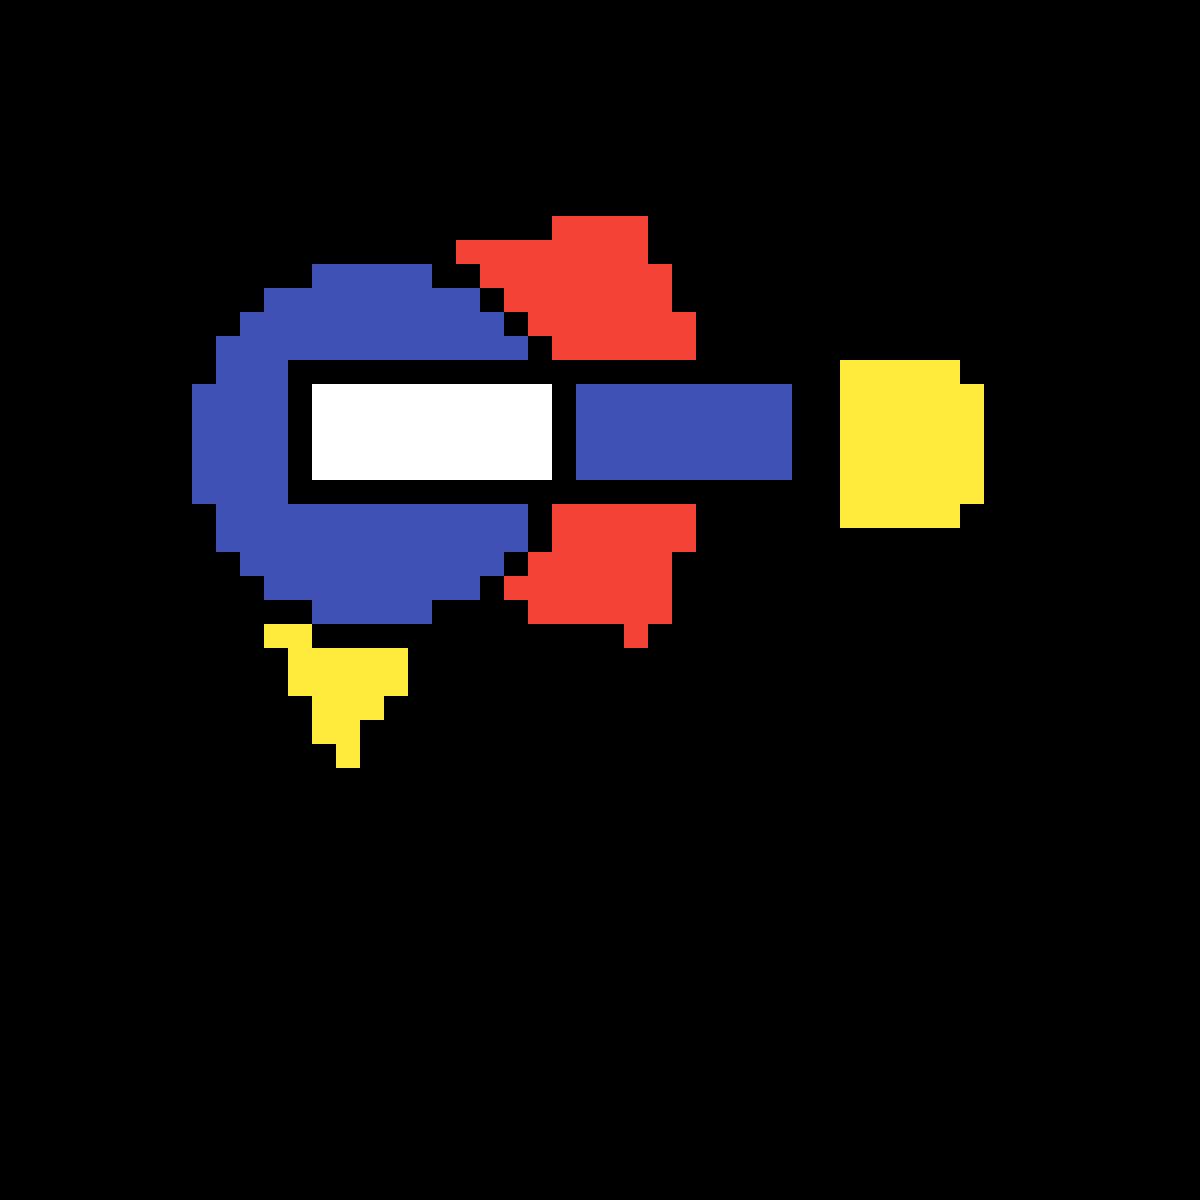 Pixel art Sticker Redbubble Clip art.